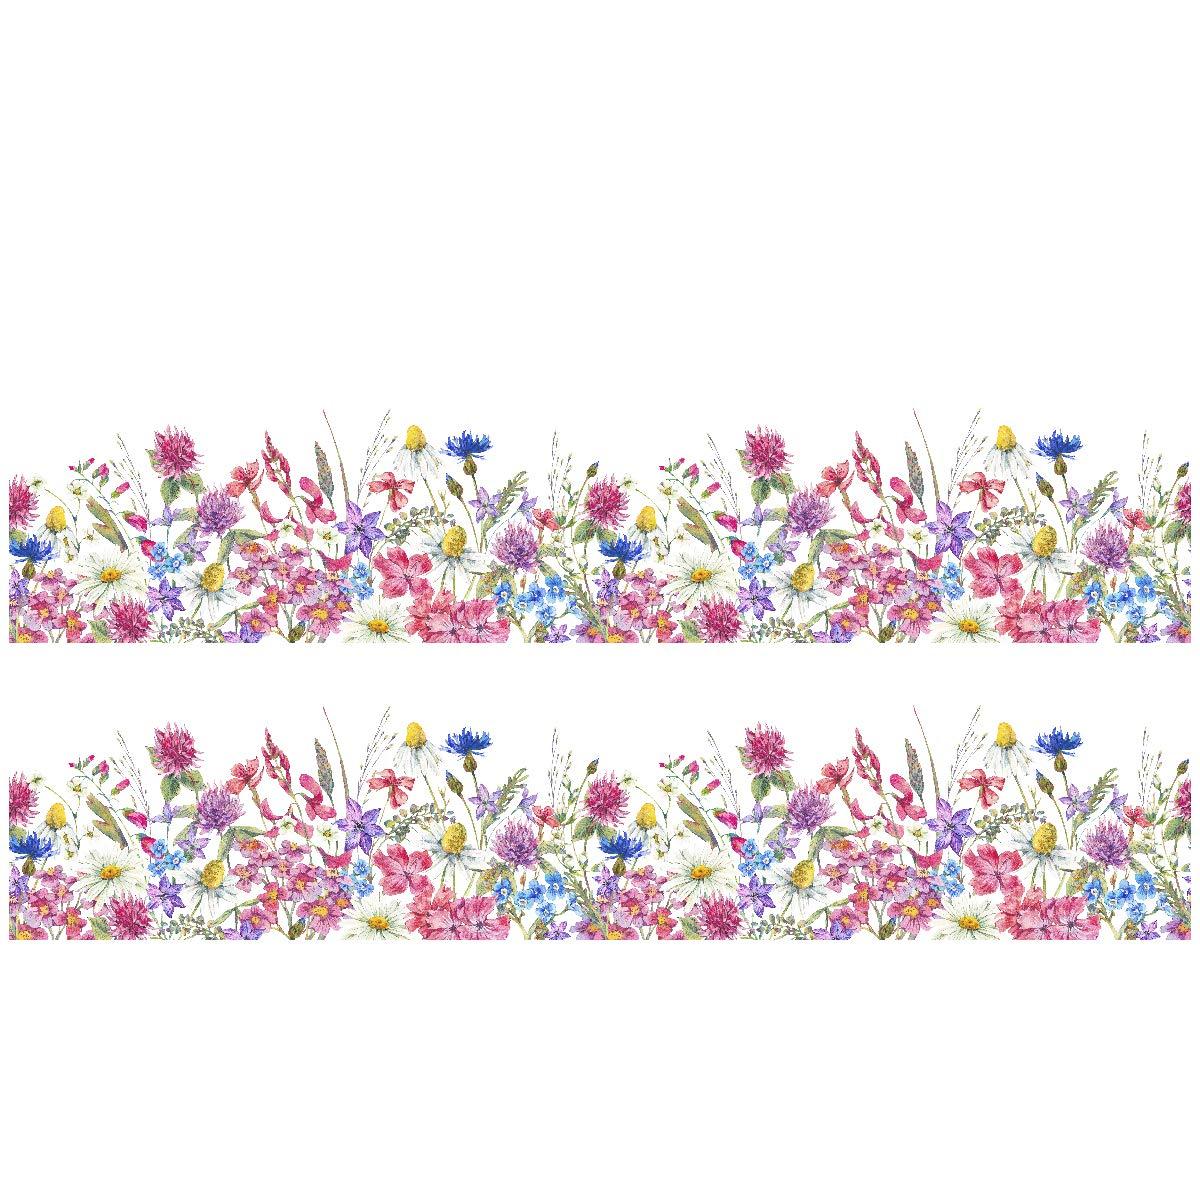 Wandkings Bordüre - Wähle ein Motiv - Aquarell Blumen - 2x selbstklebende Wandbordüren je 100 cm - Gesamtlänge: 200 cm - Höhe: 12, 5 cm